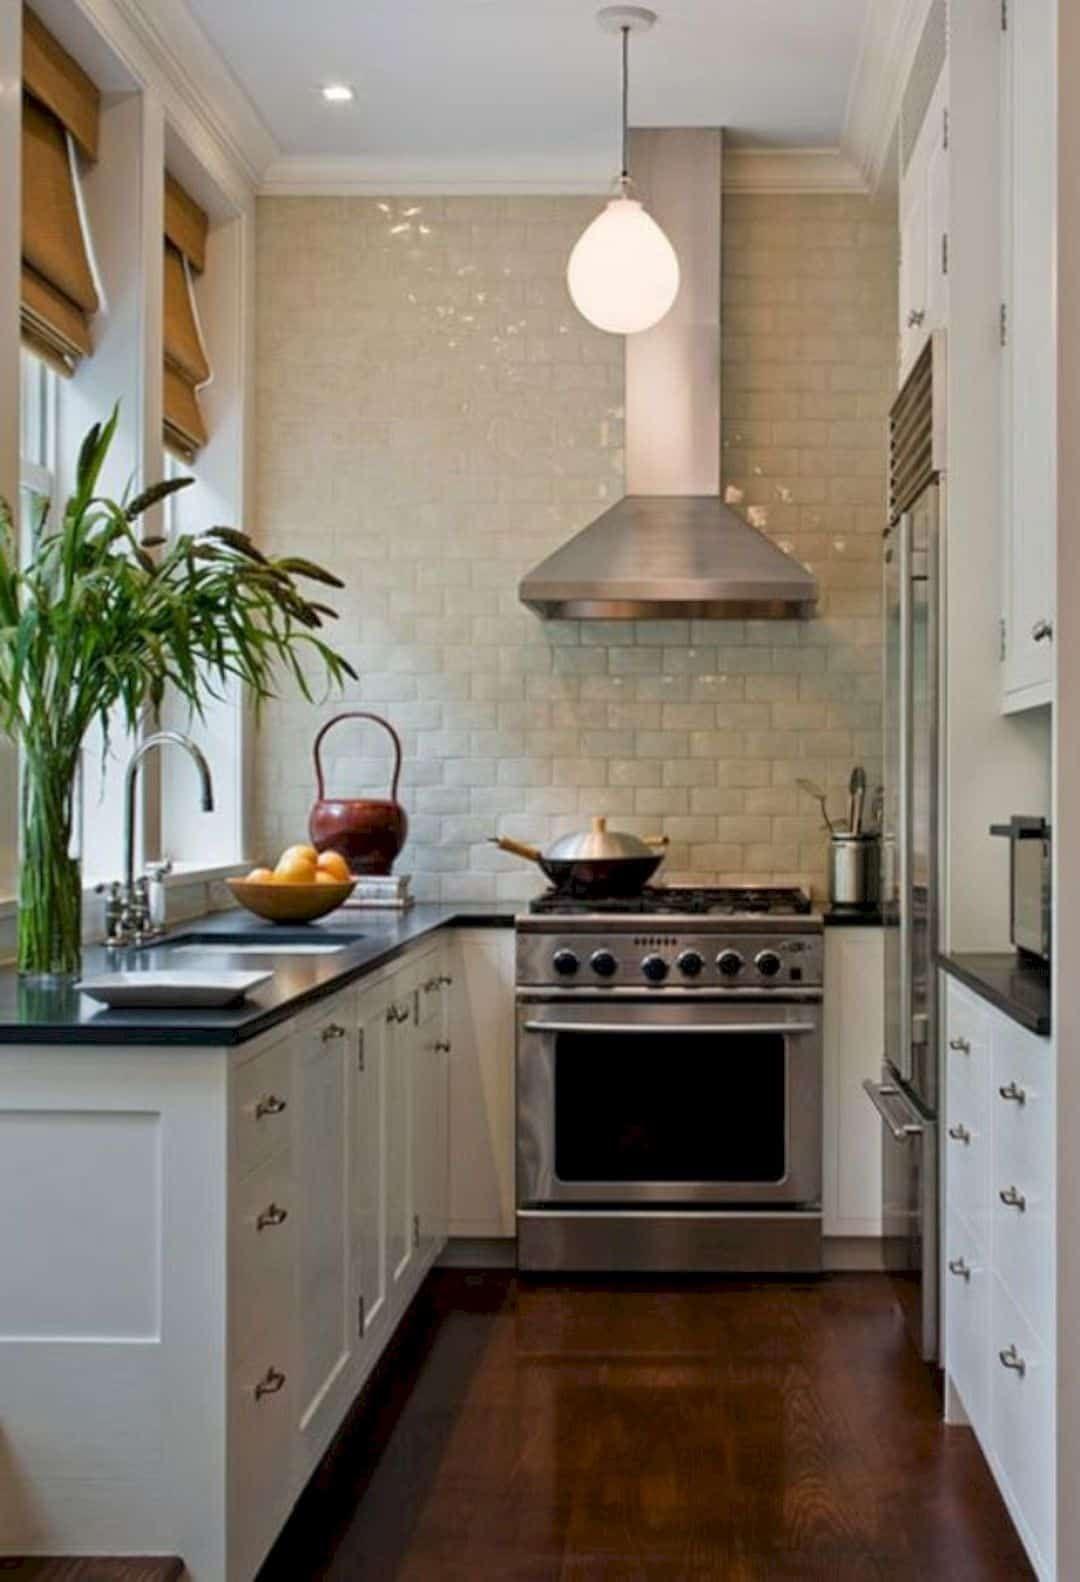 17 Small Townhouse Interior Design Ideas Kitchen Remodel Small Kitchen Design Small Kitchen Design